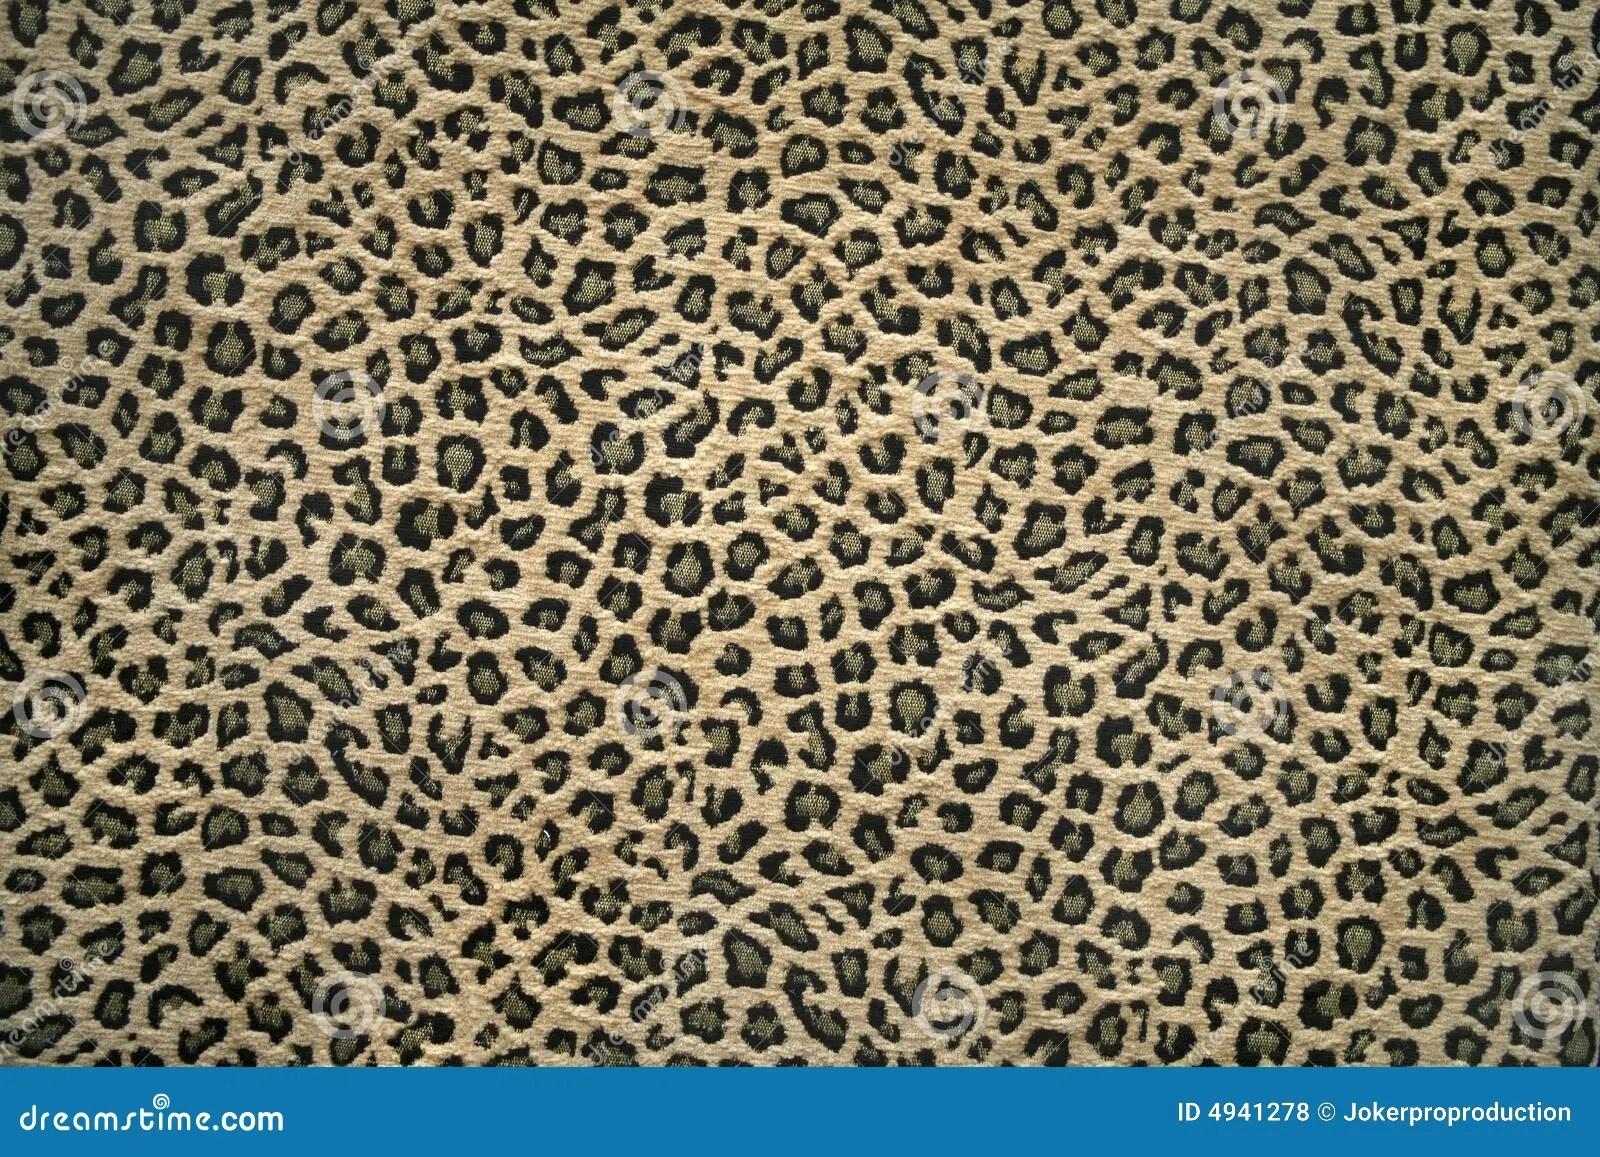 Leopard skin pattern stock illustration Illustration of